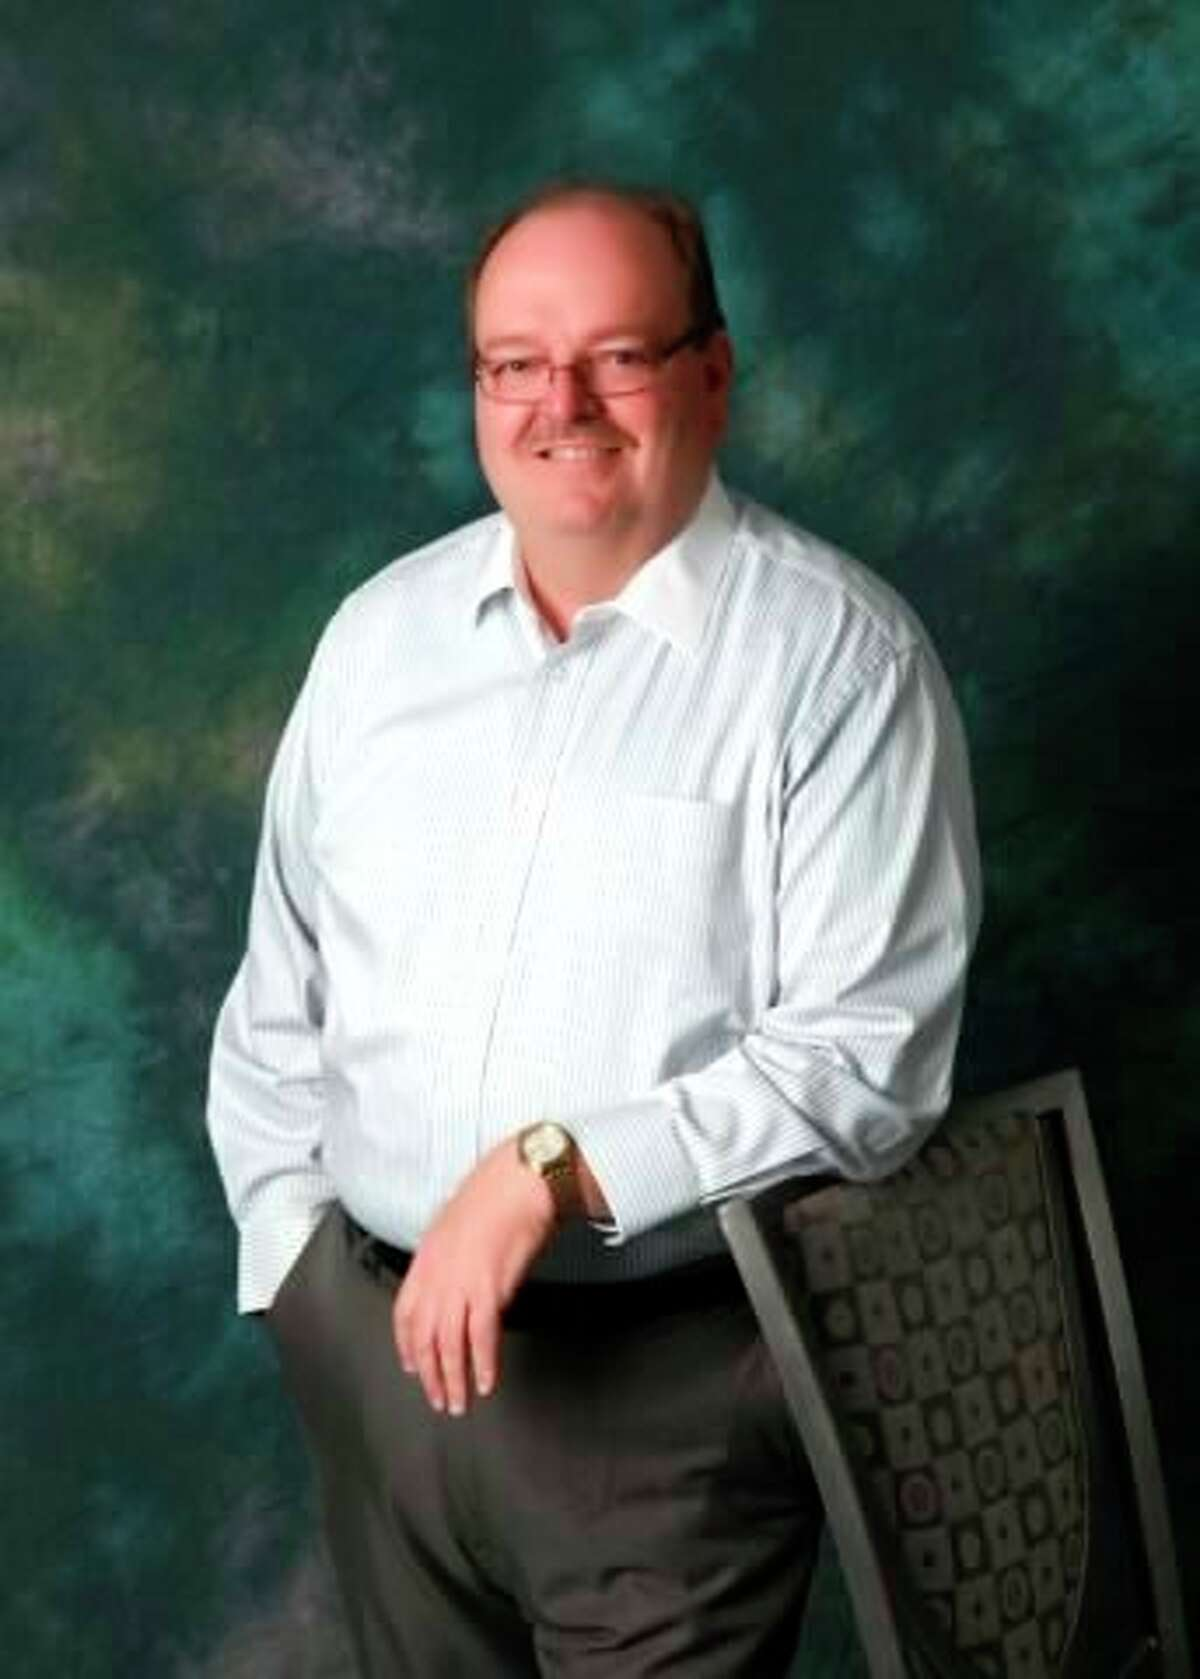 Tuscola County Commissioner Dan Grimshaw